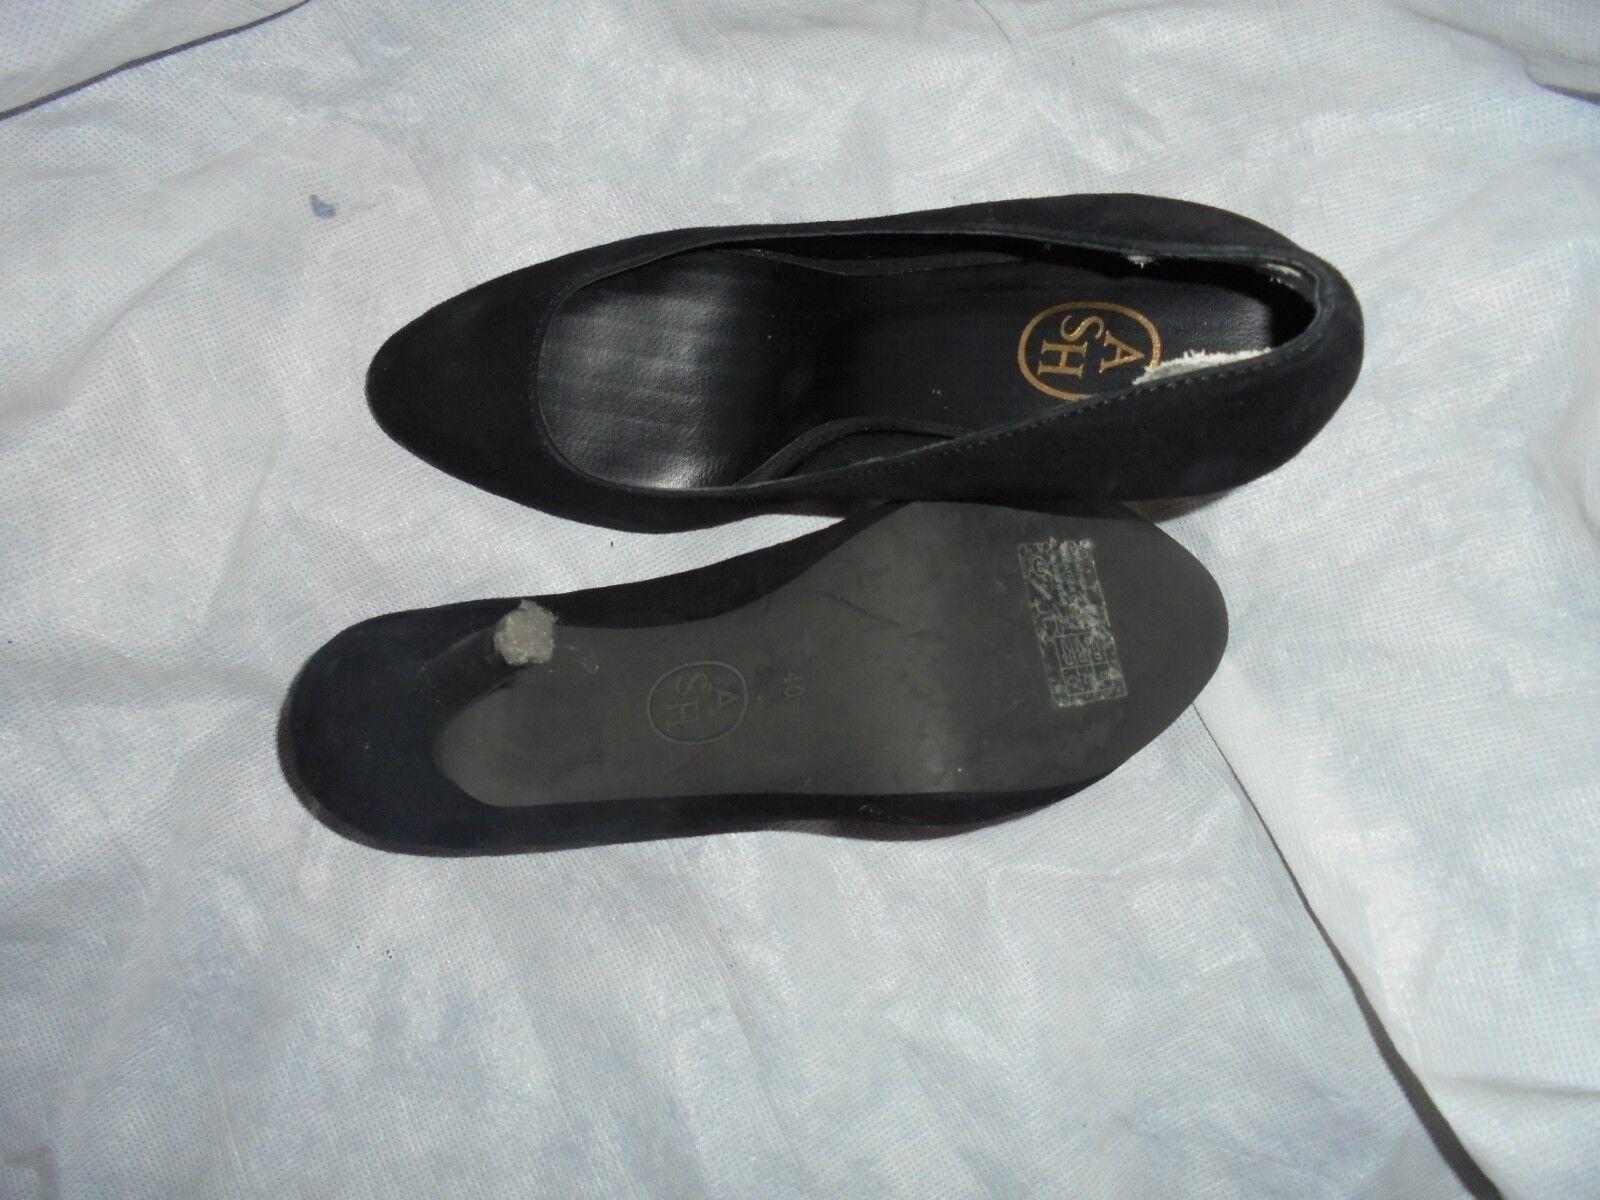 ASH WOMEN BLACK SUEDE LEATHER SLIP ON HEEL Schuhe SIZE UK 7 EU 40 VGC